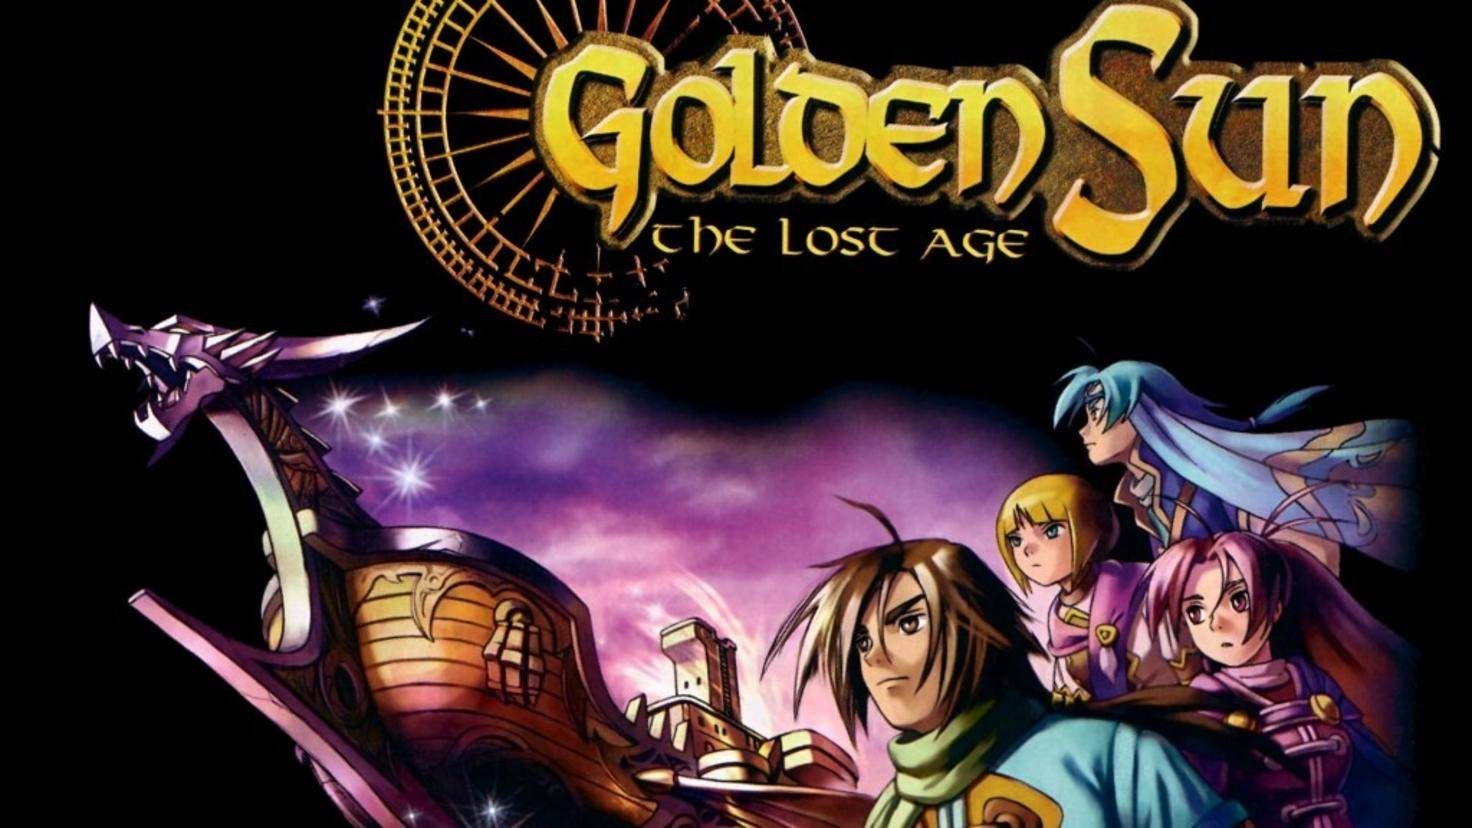 Golden-Sun-Lost-Age